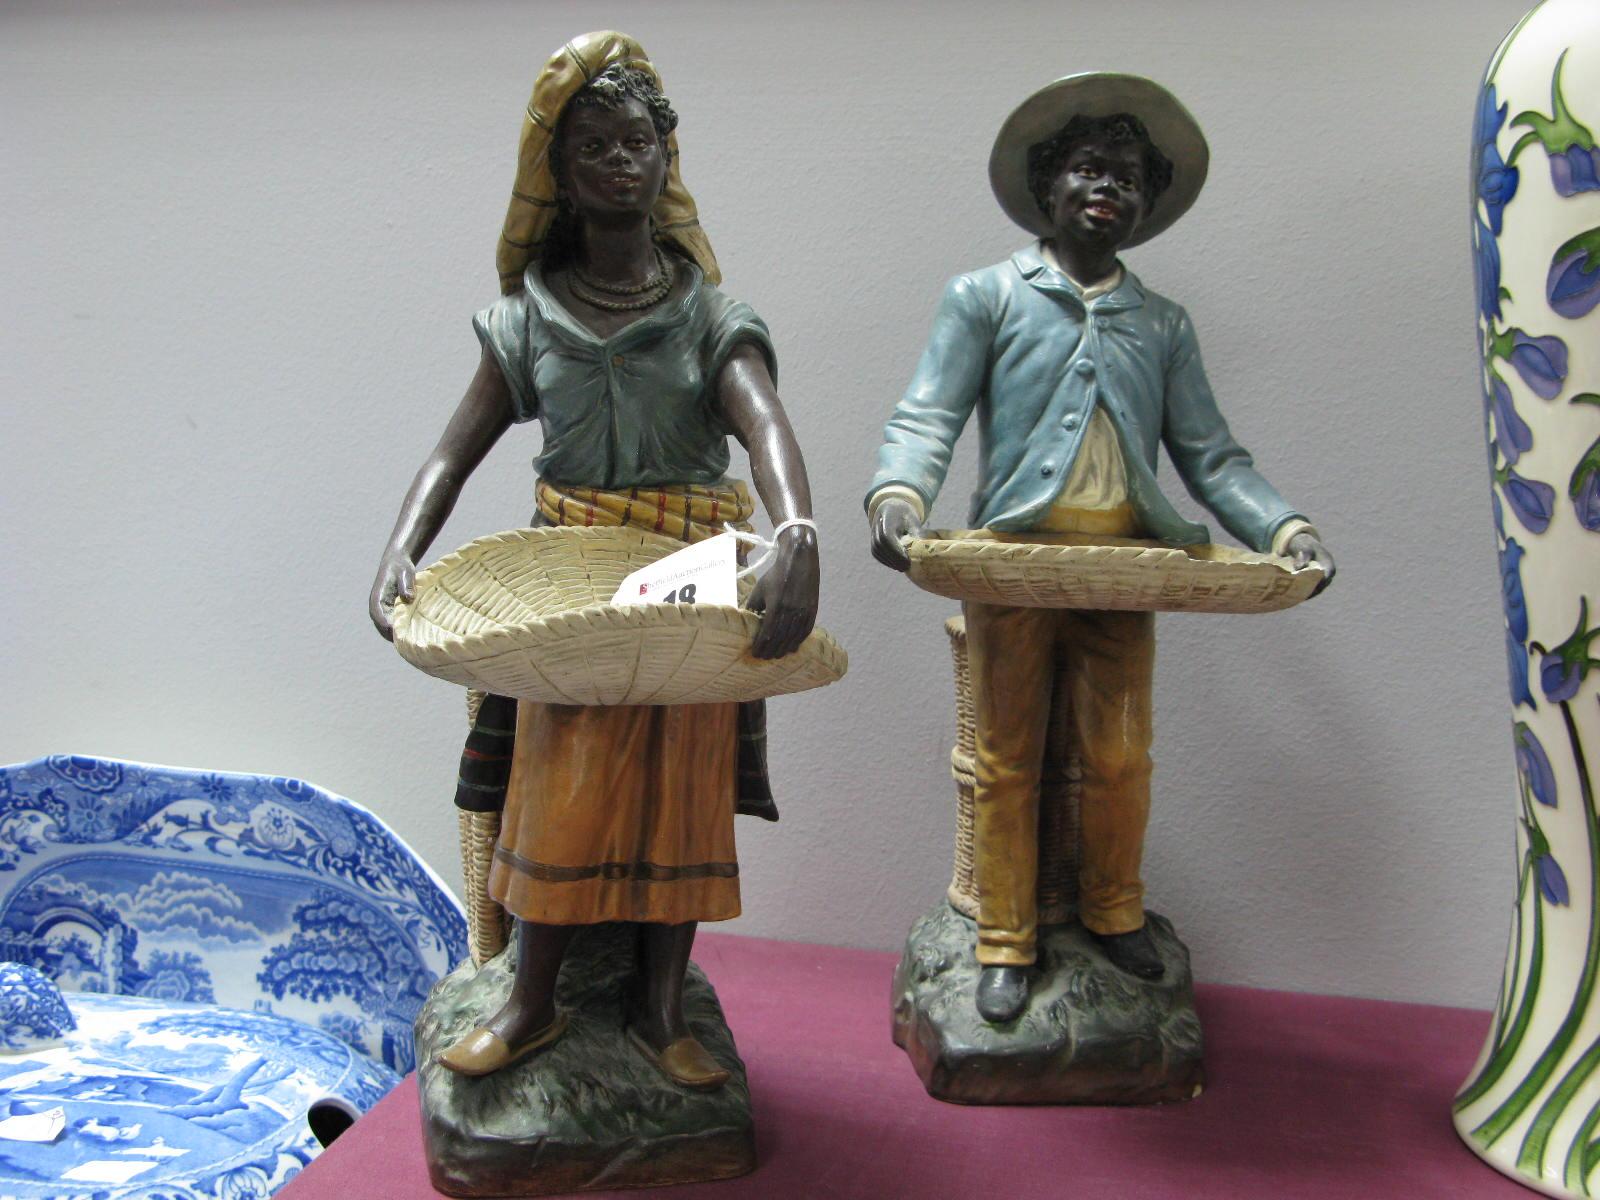 Lot 18 - A Pair of Early XX Century Austrian Terracotta Figures, modelled as Moorish basket sellers in